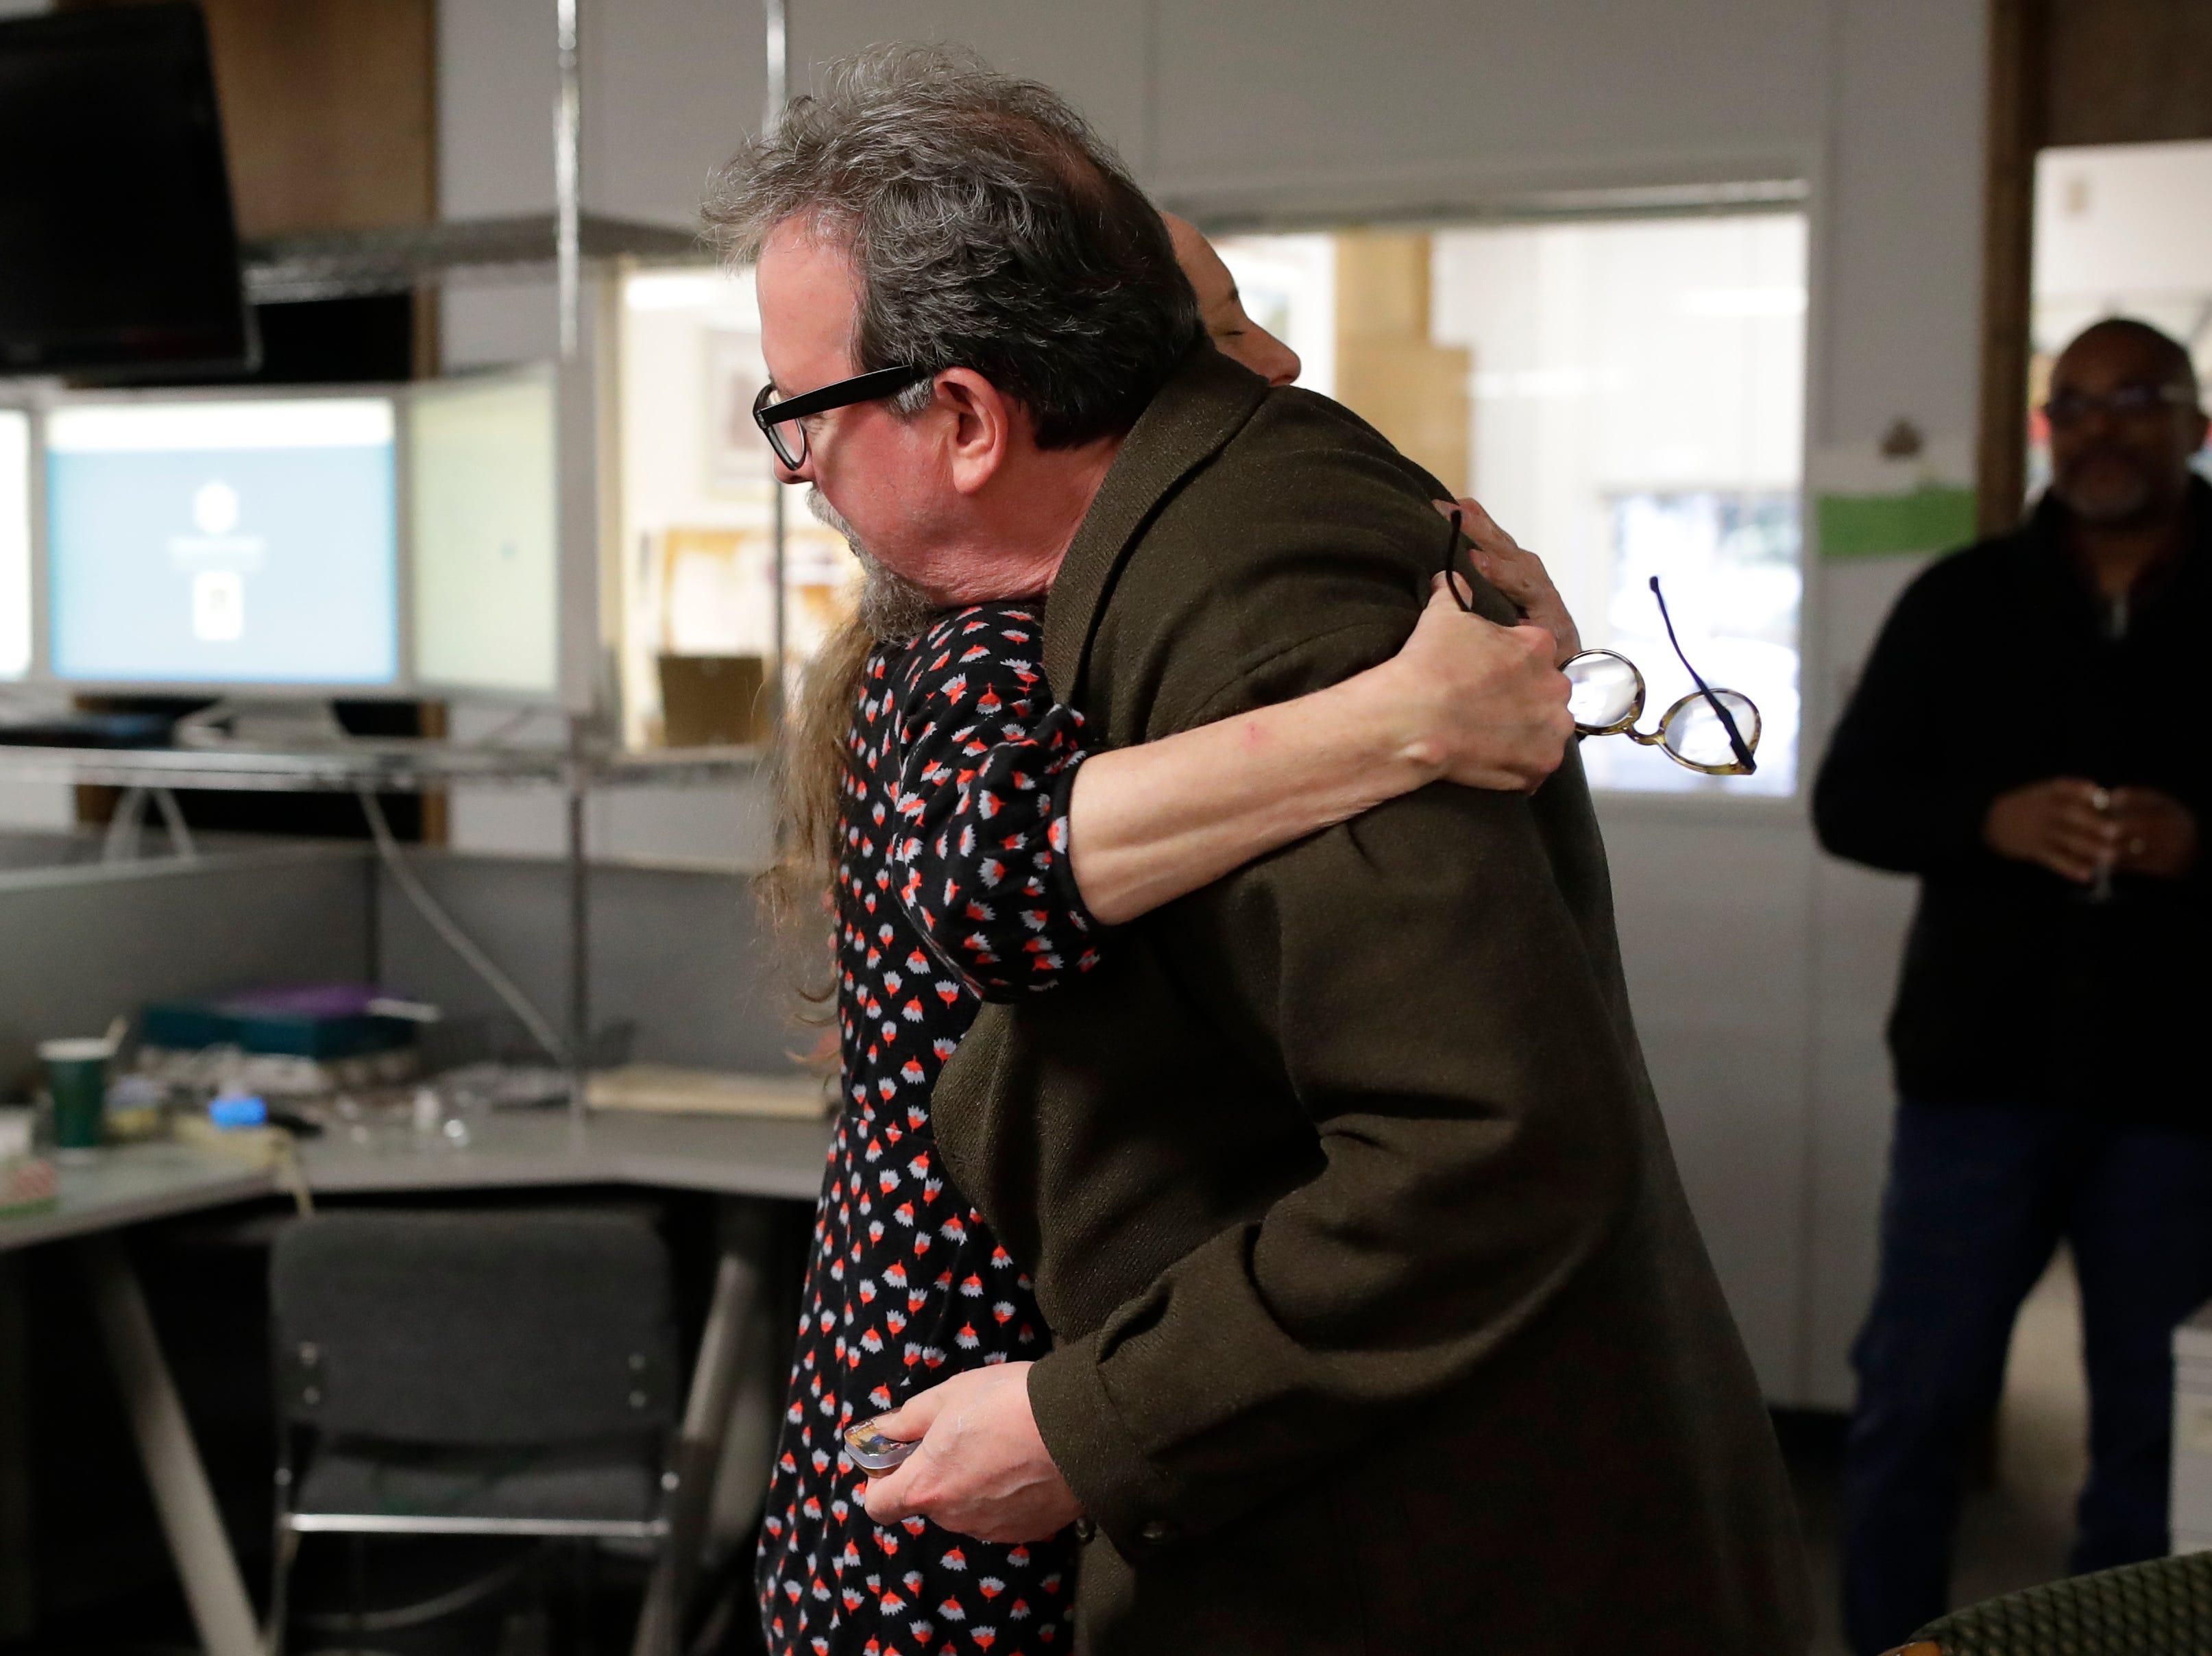 News Director Jennifer Portman hugs Former Arts and Entertainment Editor Mark Hinson on his last day of work at the Tallahassee Democrat Wednesday, Jan. 2, 2019.